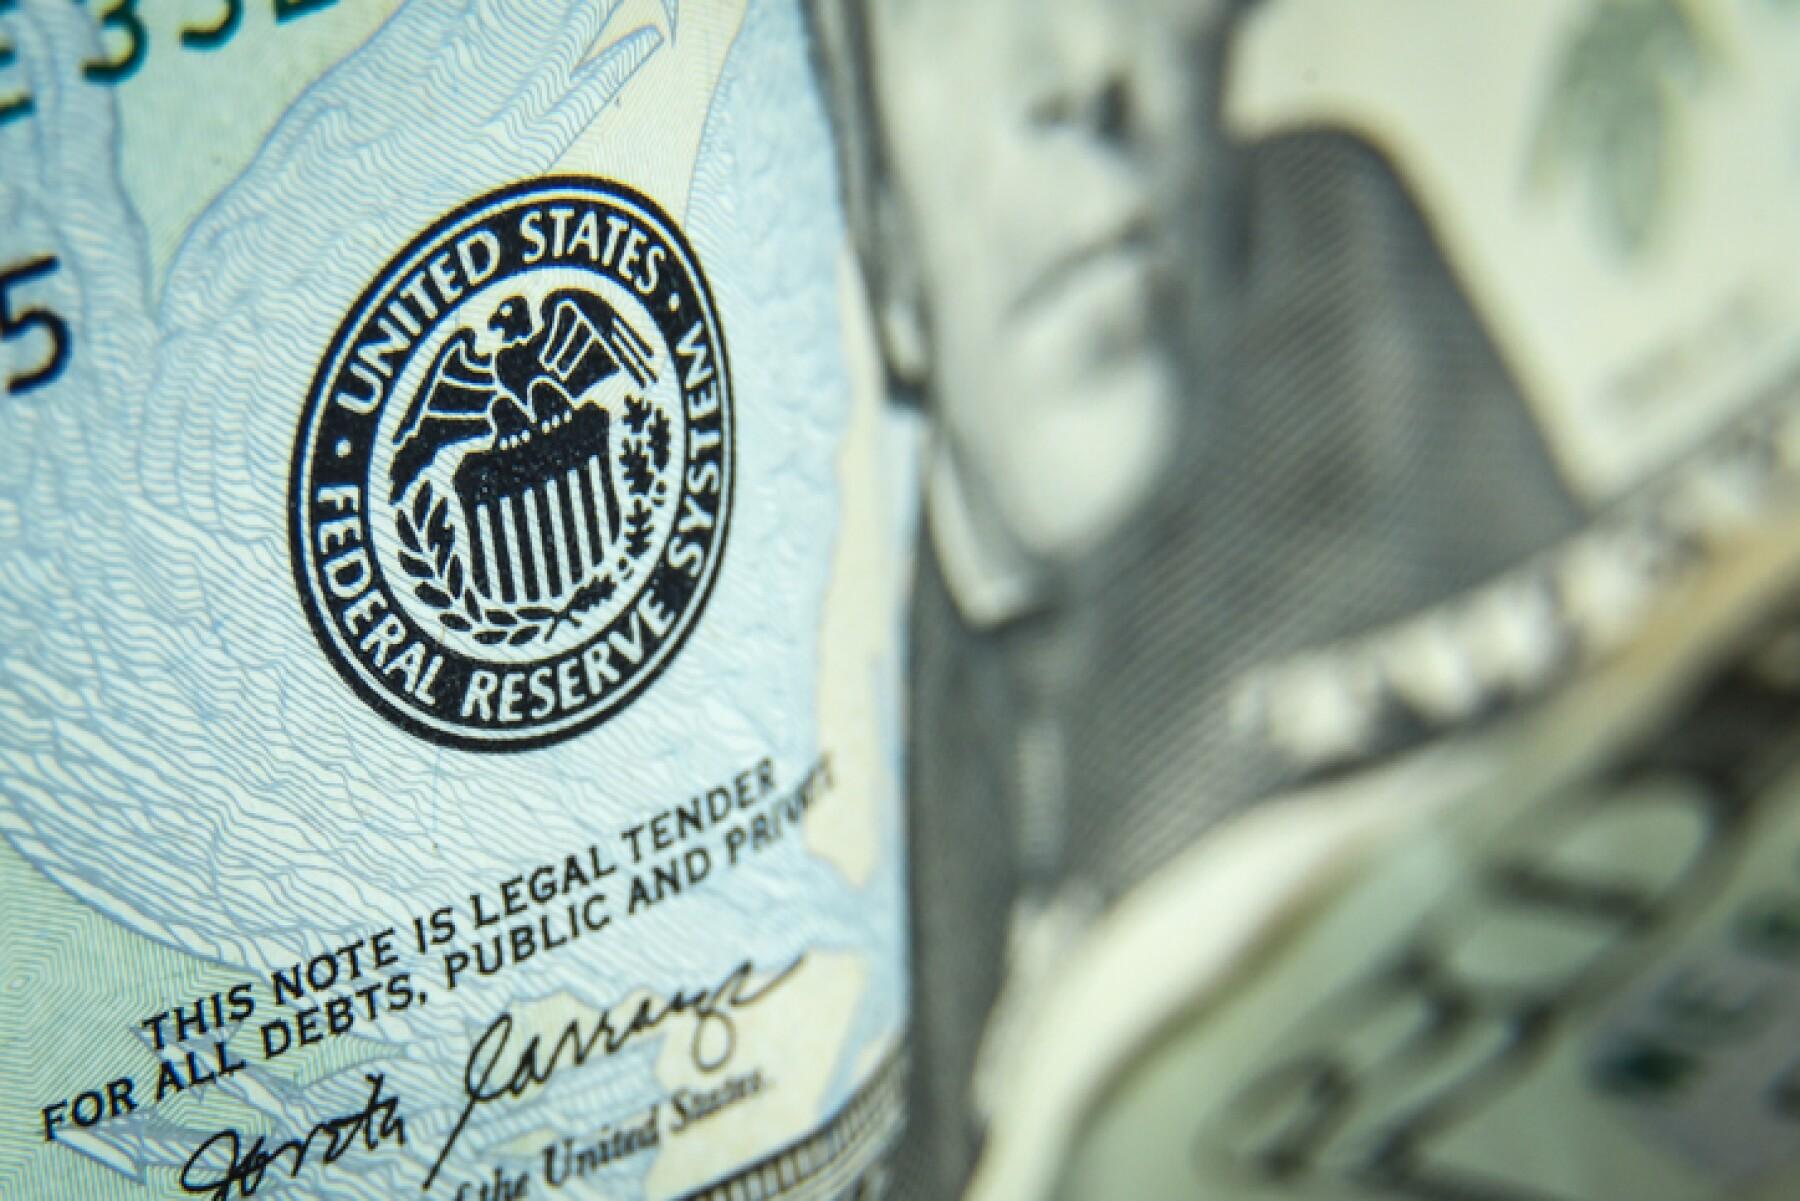 Twenty dollars bills - close up and reflection of US paper money